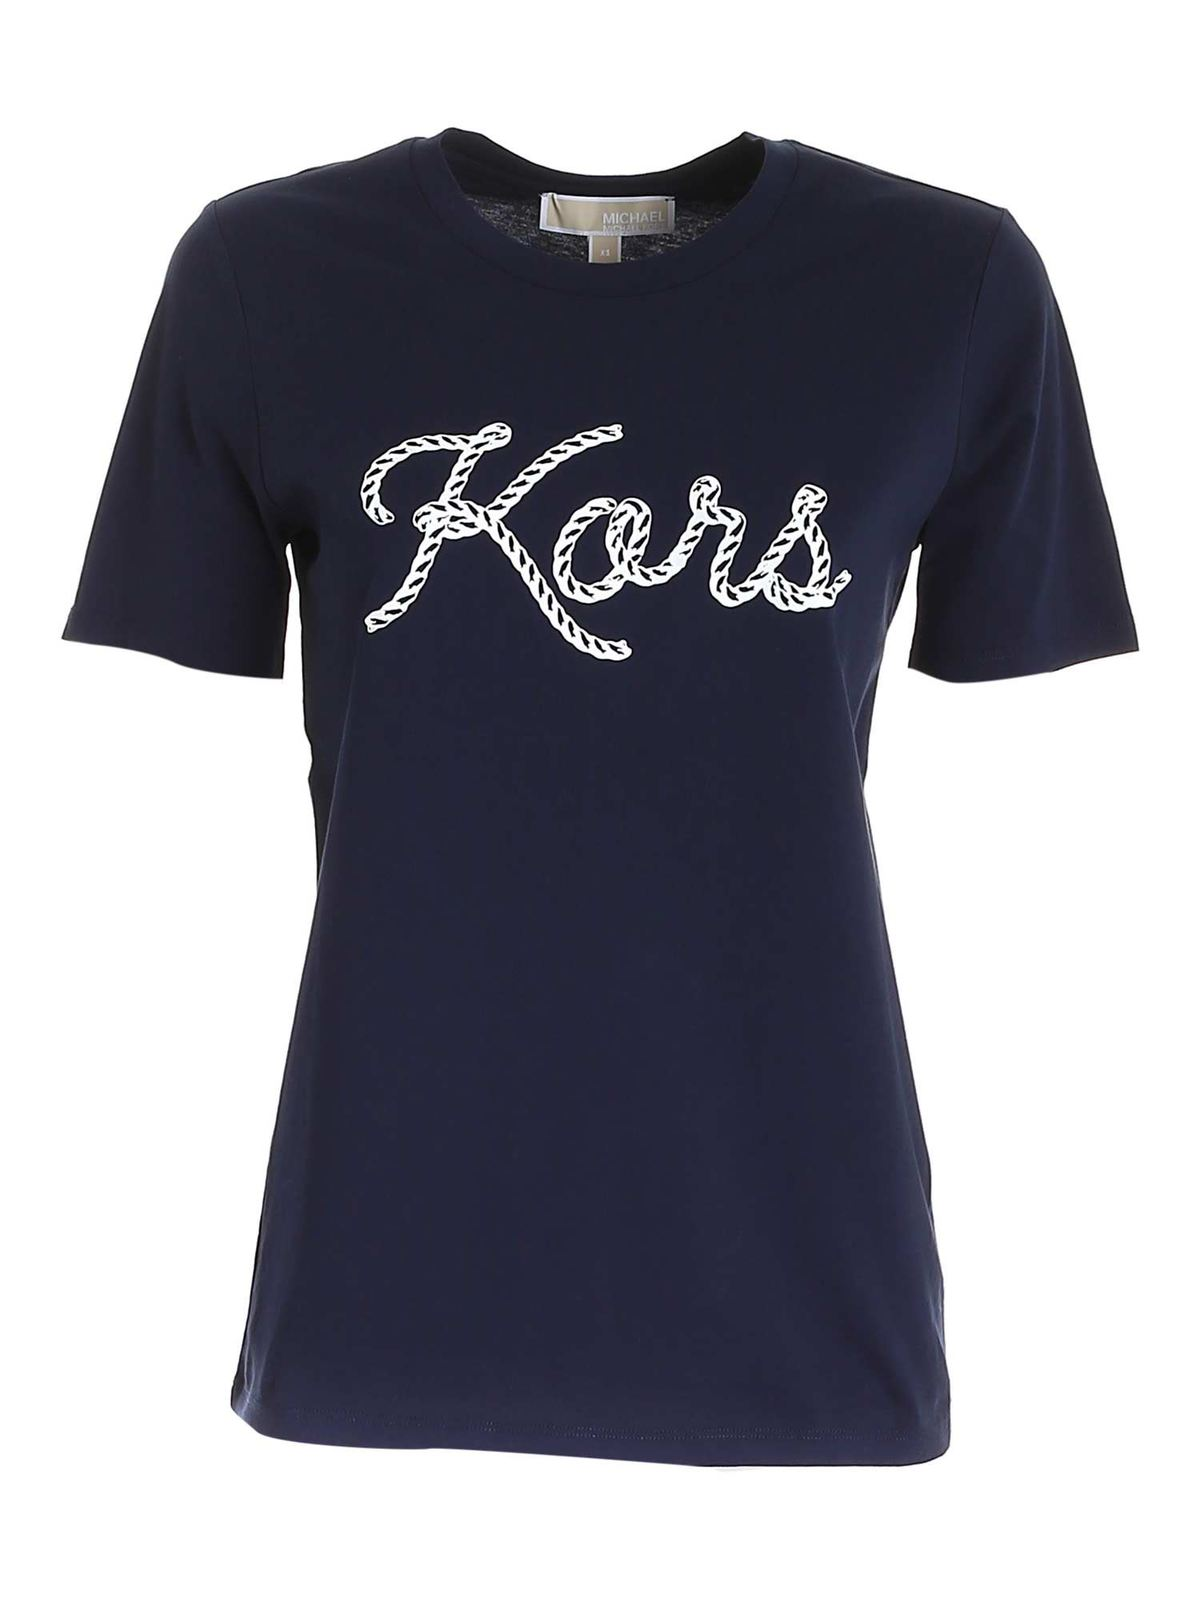 Michael Kors T-shirts KORS PRINT T-SHIRT IN BLUE